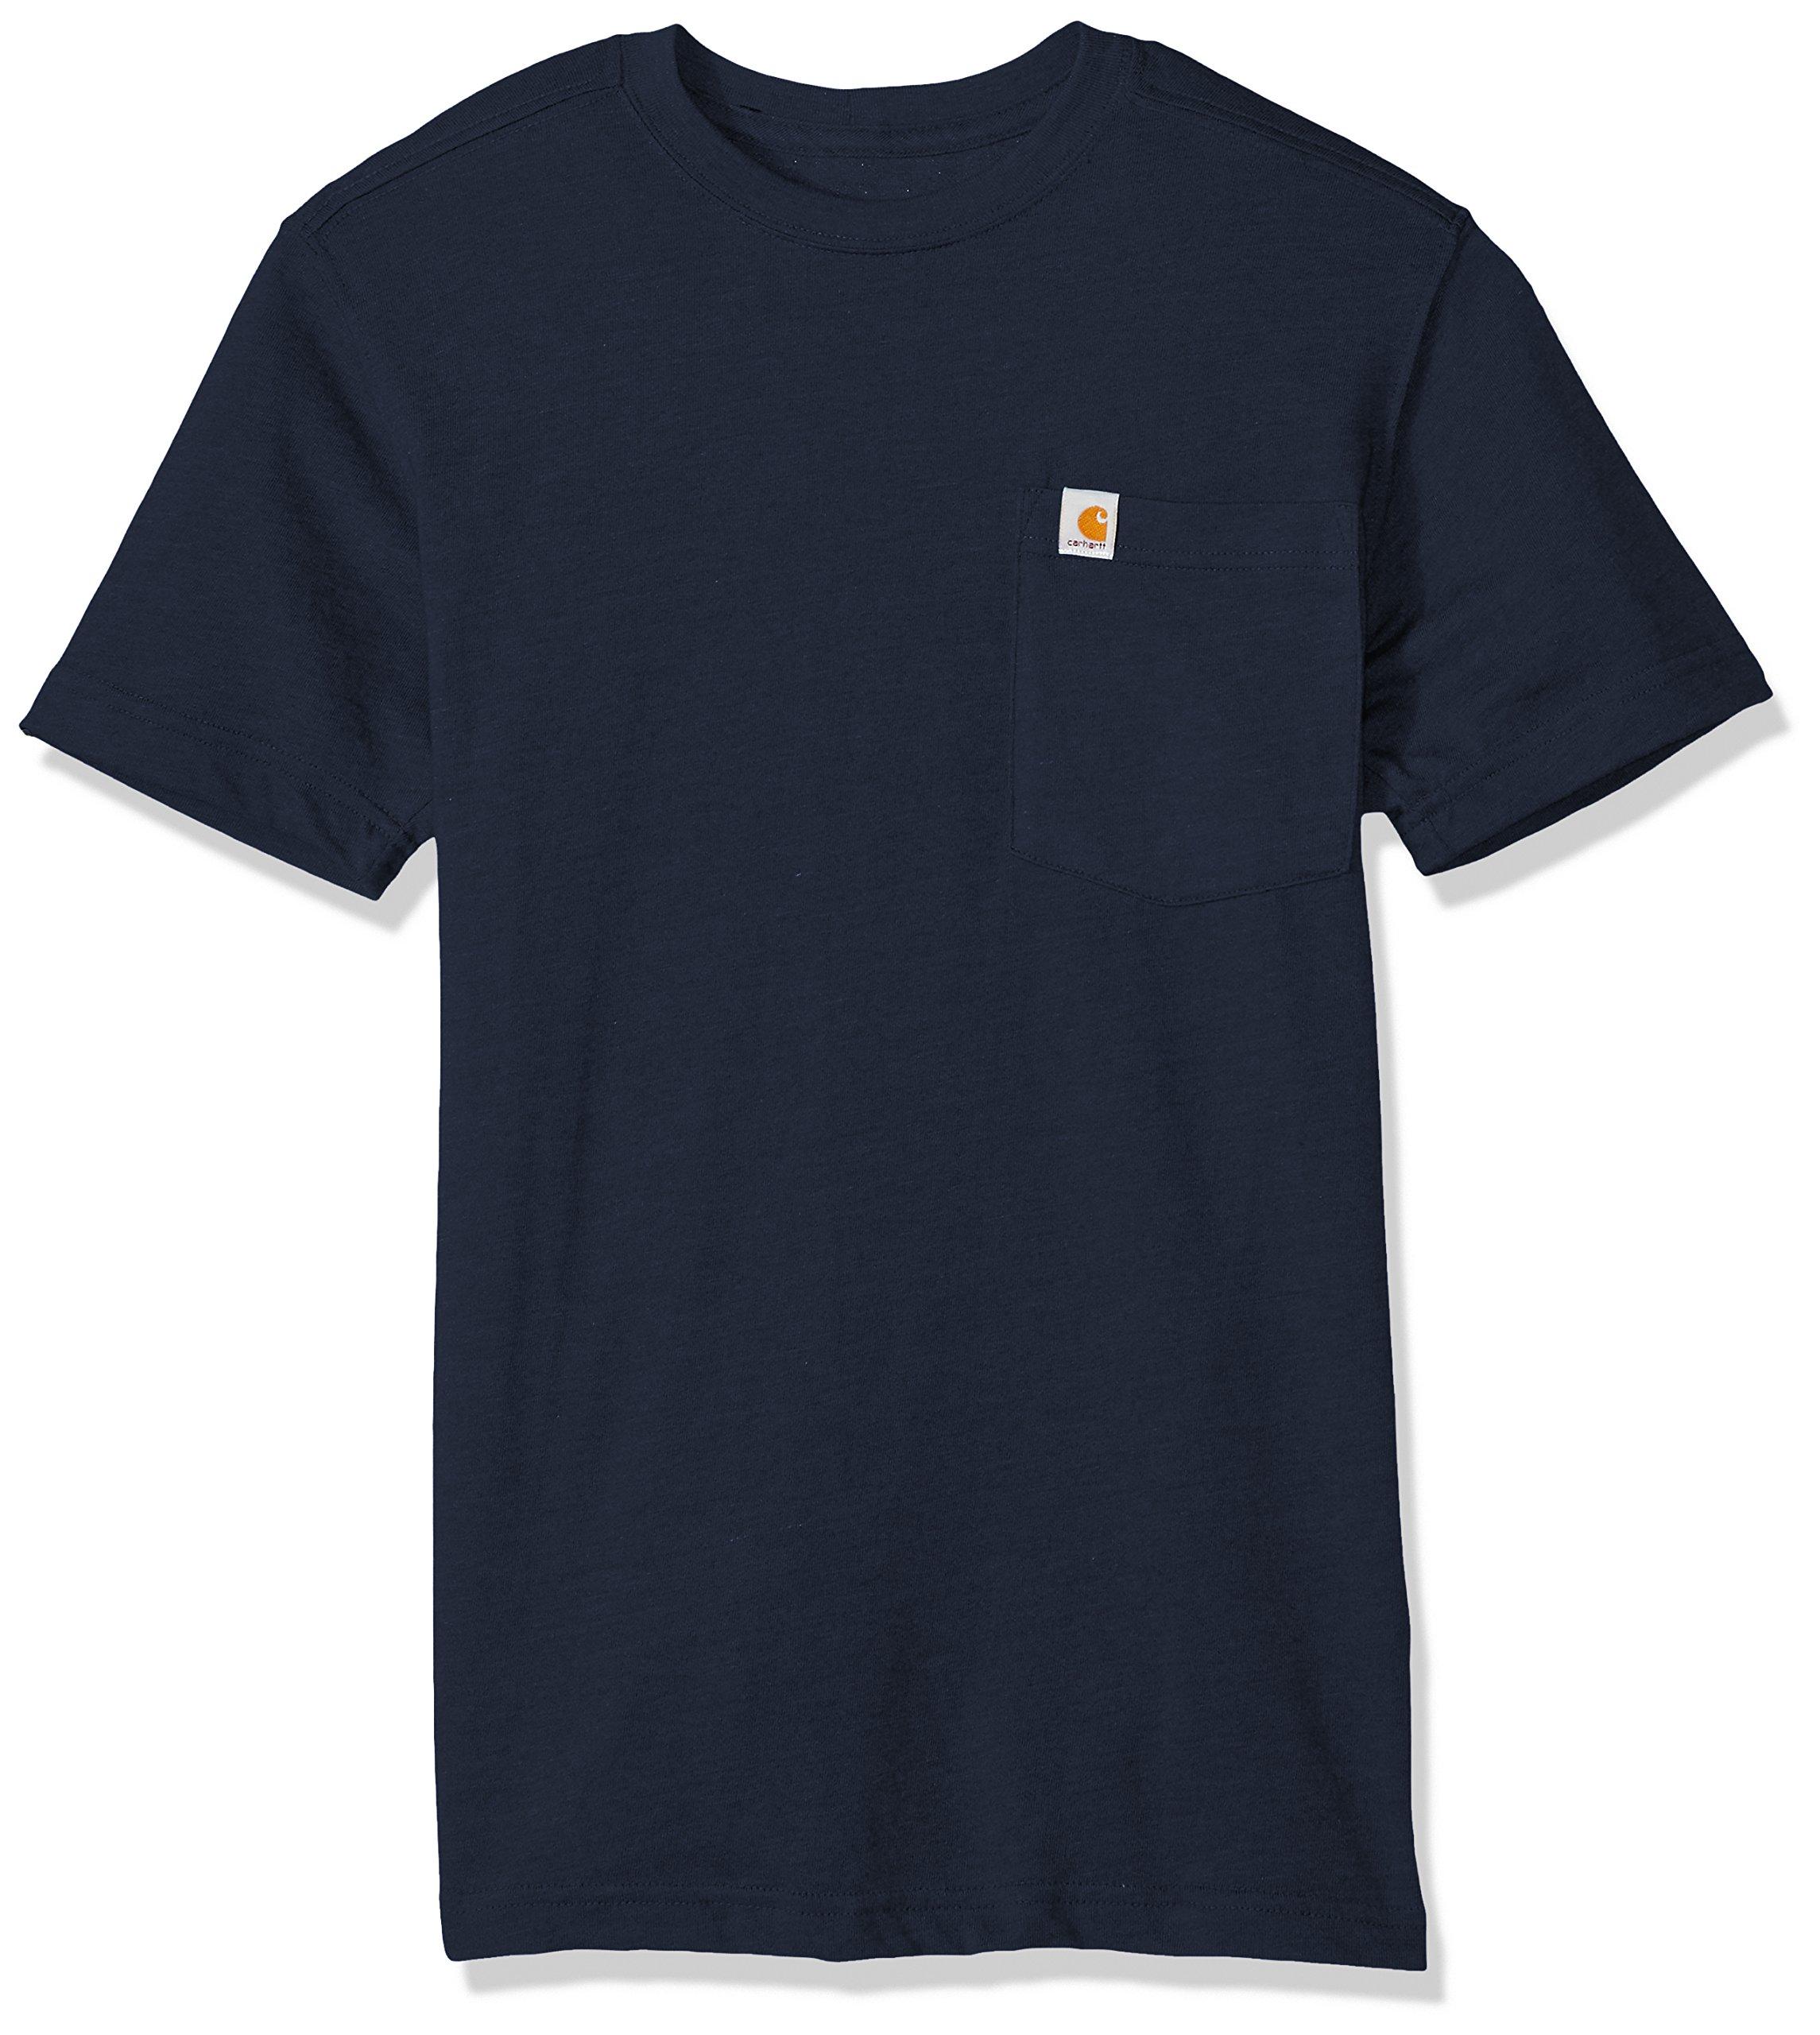 Carhartt Men's Tall Size Maddock Pocket Short Sleeve T-Shirt, Navy, 3XL